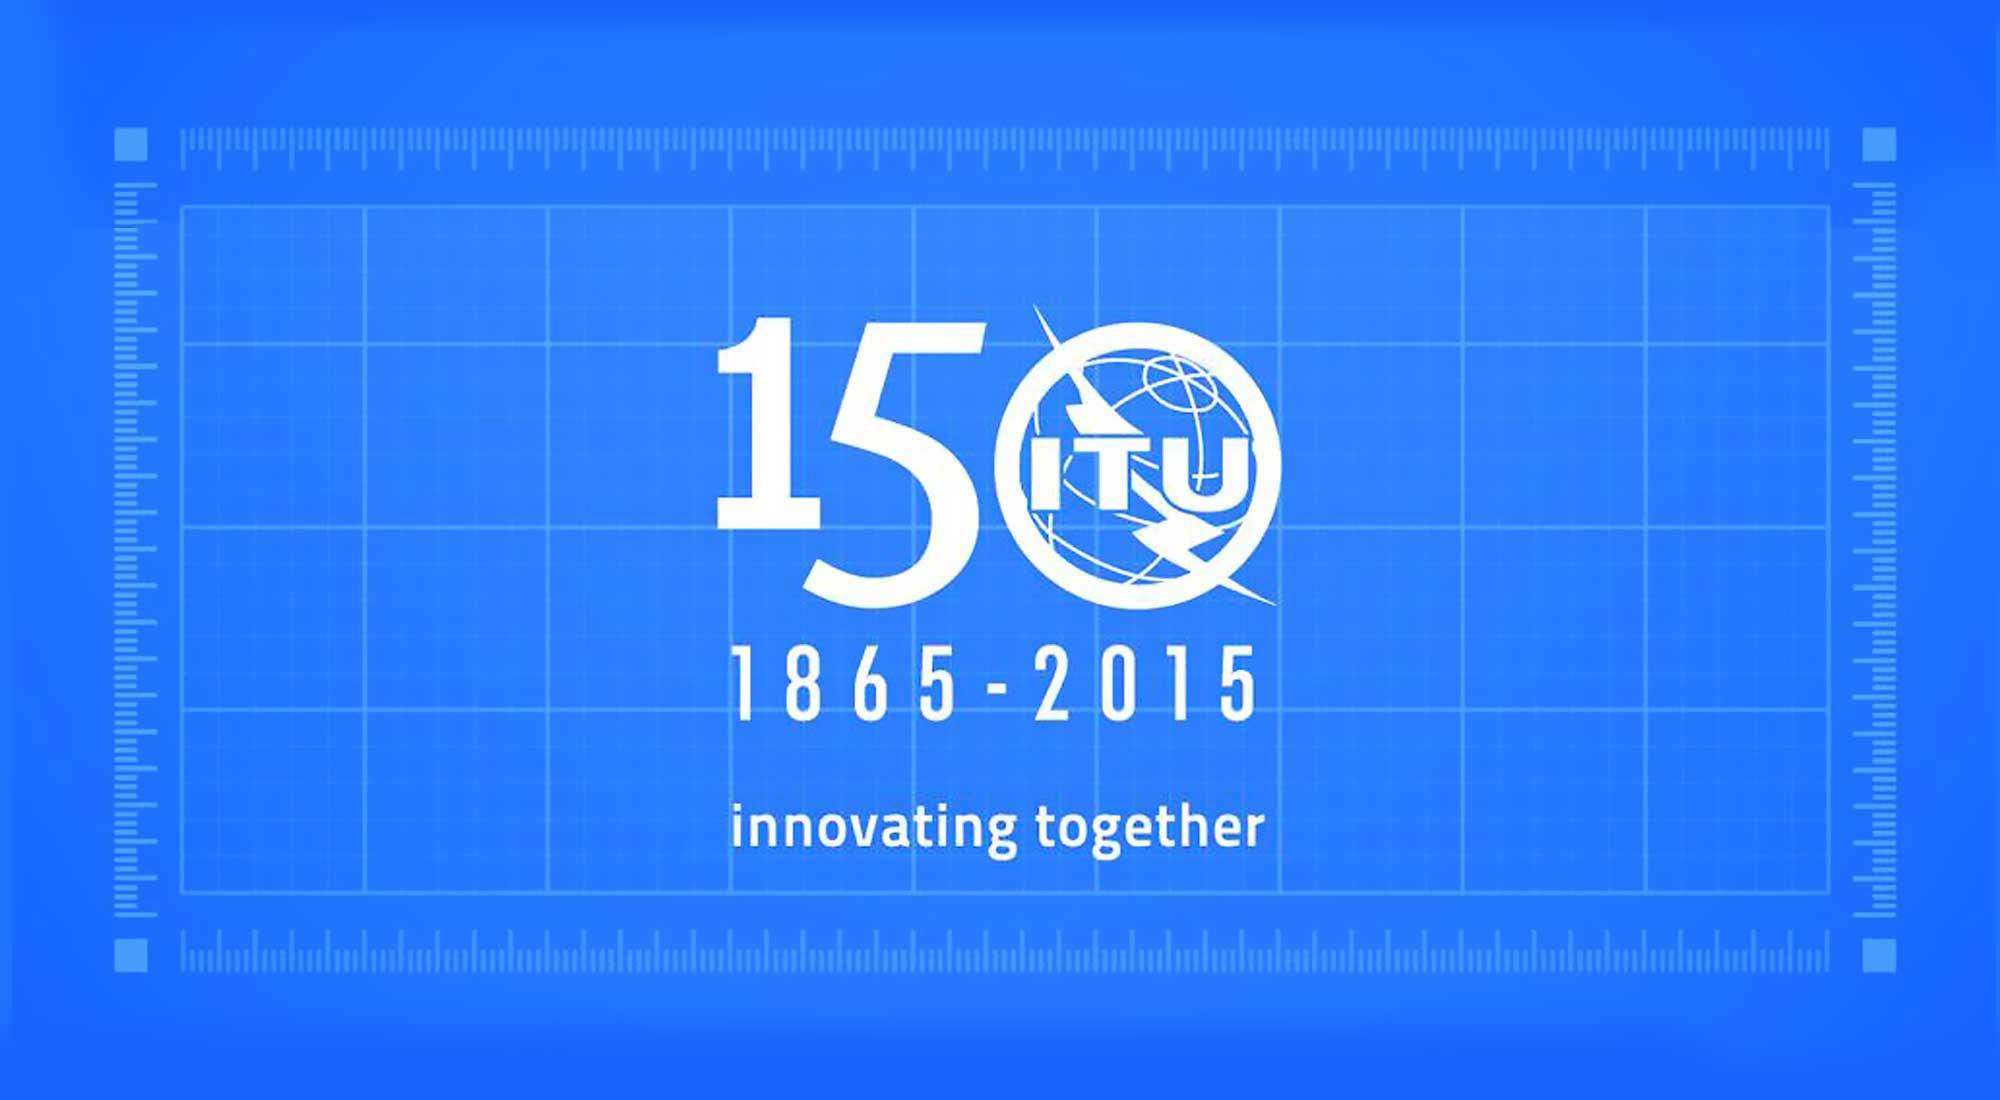 МСЭ - 150 лет / ITU - 150th